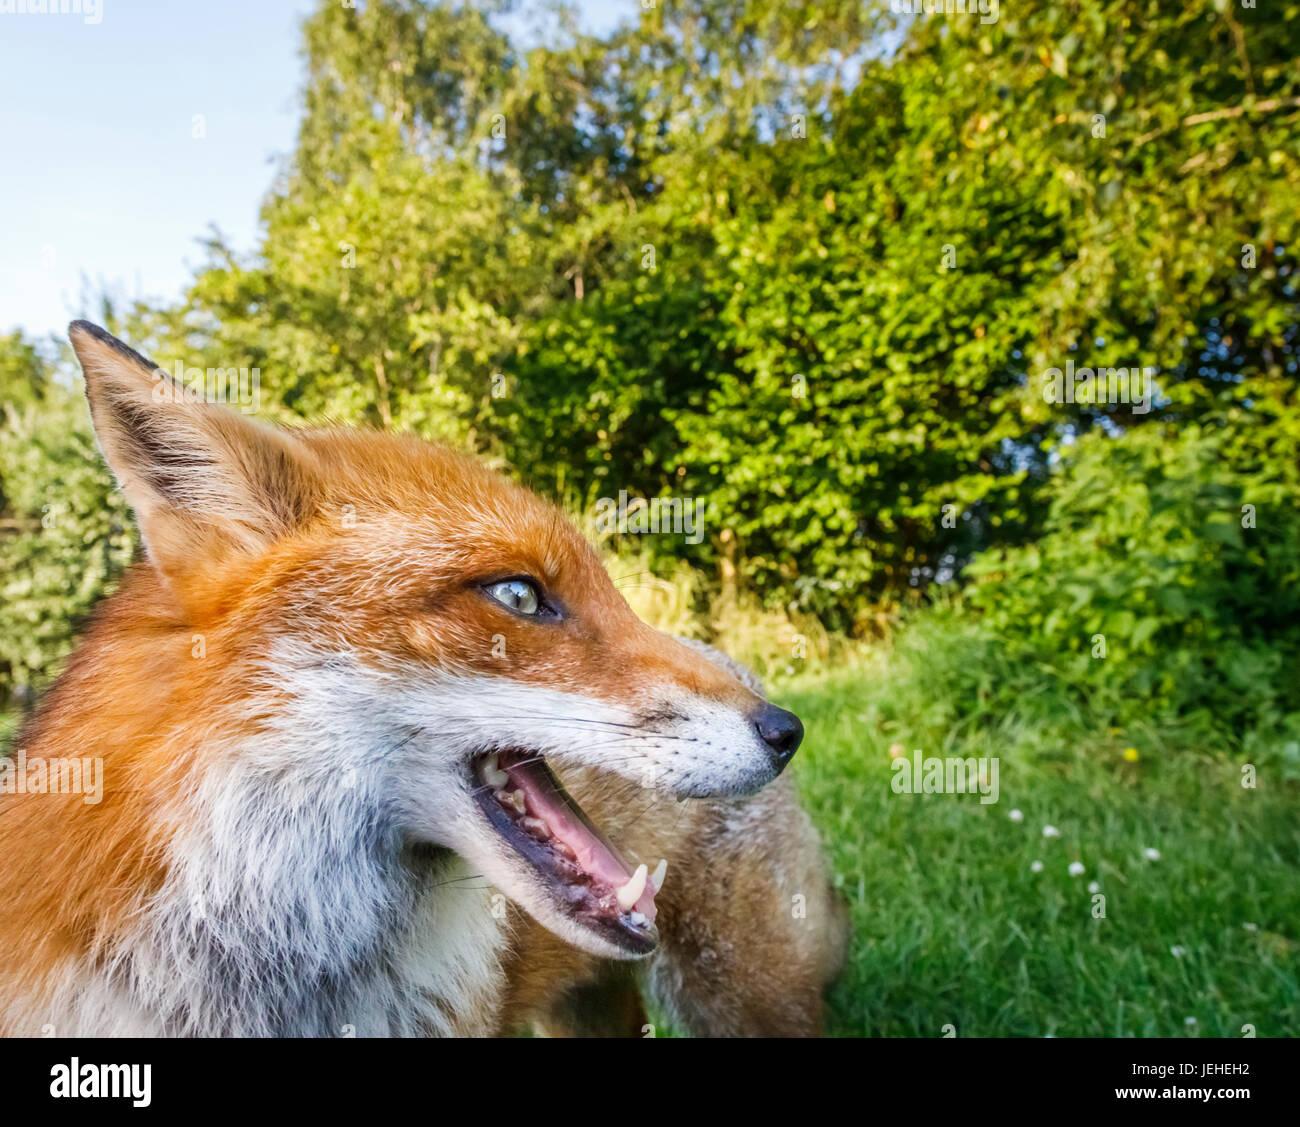 British wildlife: Fox (Vulpes vulpes), British Wildlife Centre, Newchapel, Lingfield, Surrey, UK - Stock Image